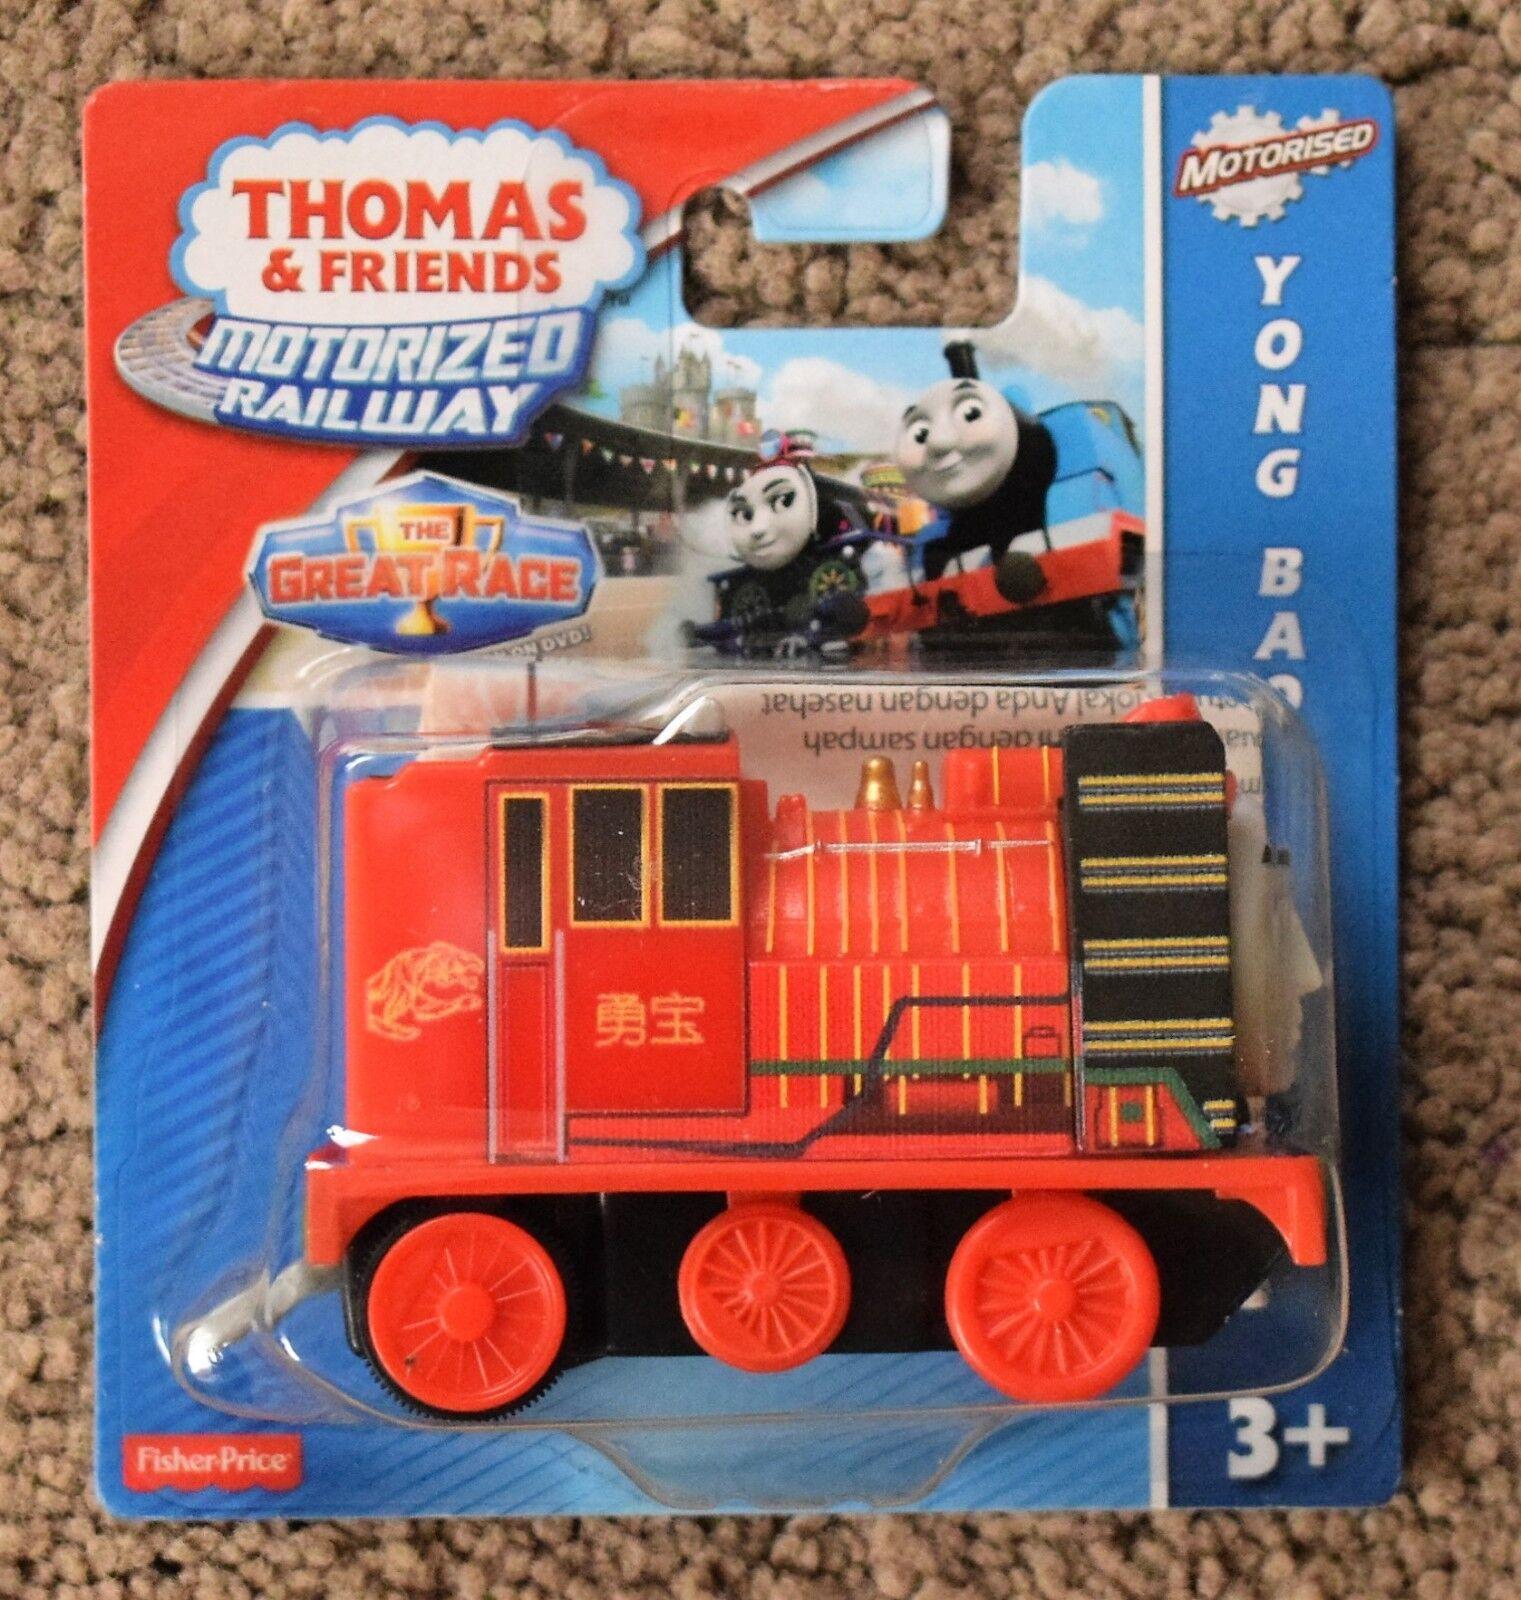 Fisher Price Thomas The Bao Tank Ferrovia Motorizzata Yong Bao The Hiro Toby Salato fde8a4